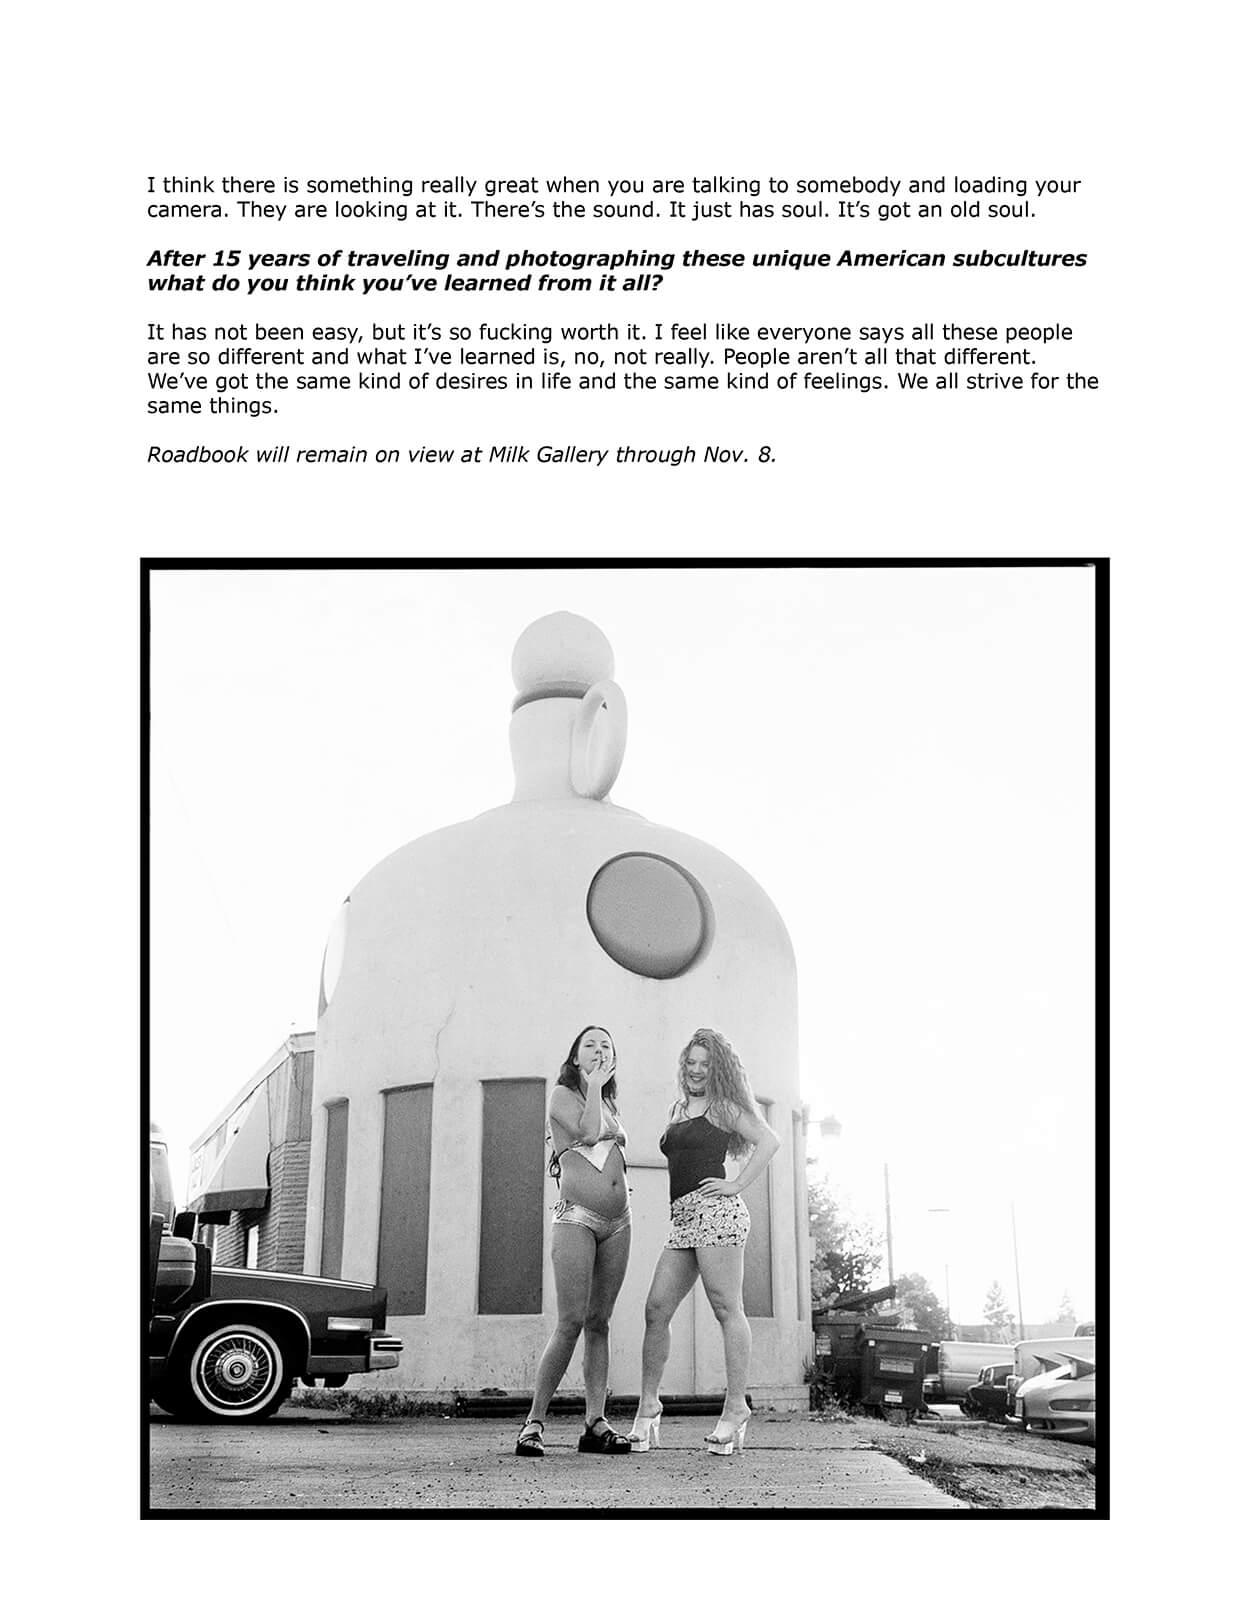 Hunter Barnes documents America's fringe communities in Roadbook - Popular Photography - Popular Photography - Page 3